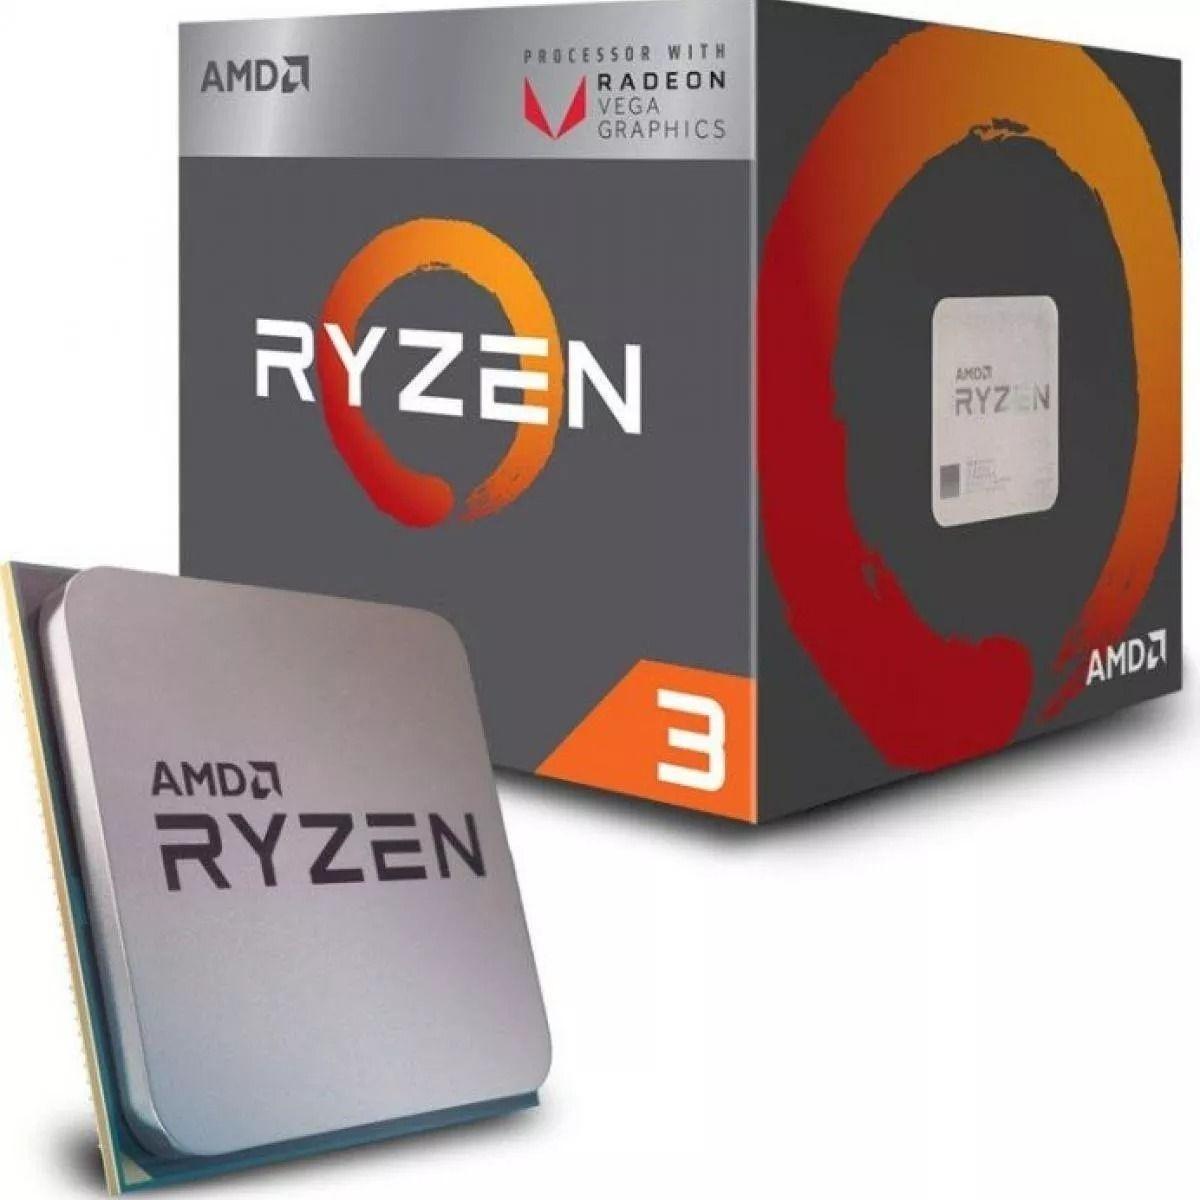 procesador-amd-ryzen-3-2200g-3-50ghz-4mb-l3-4-core-am4-14nm-65-w